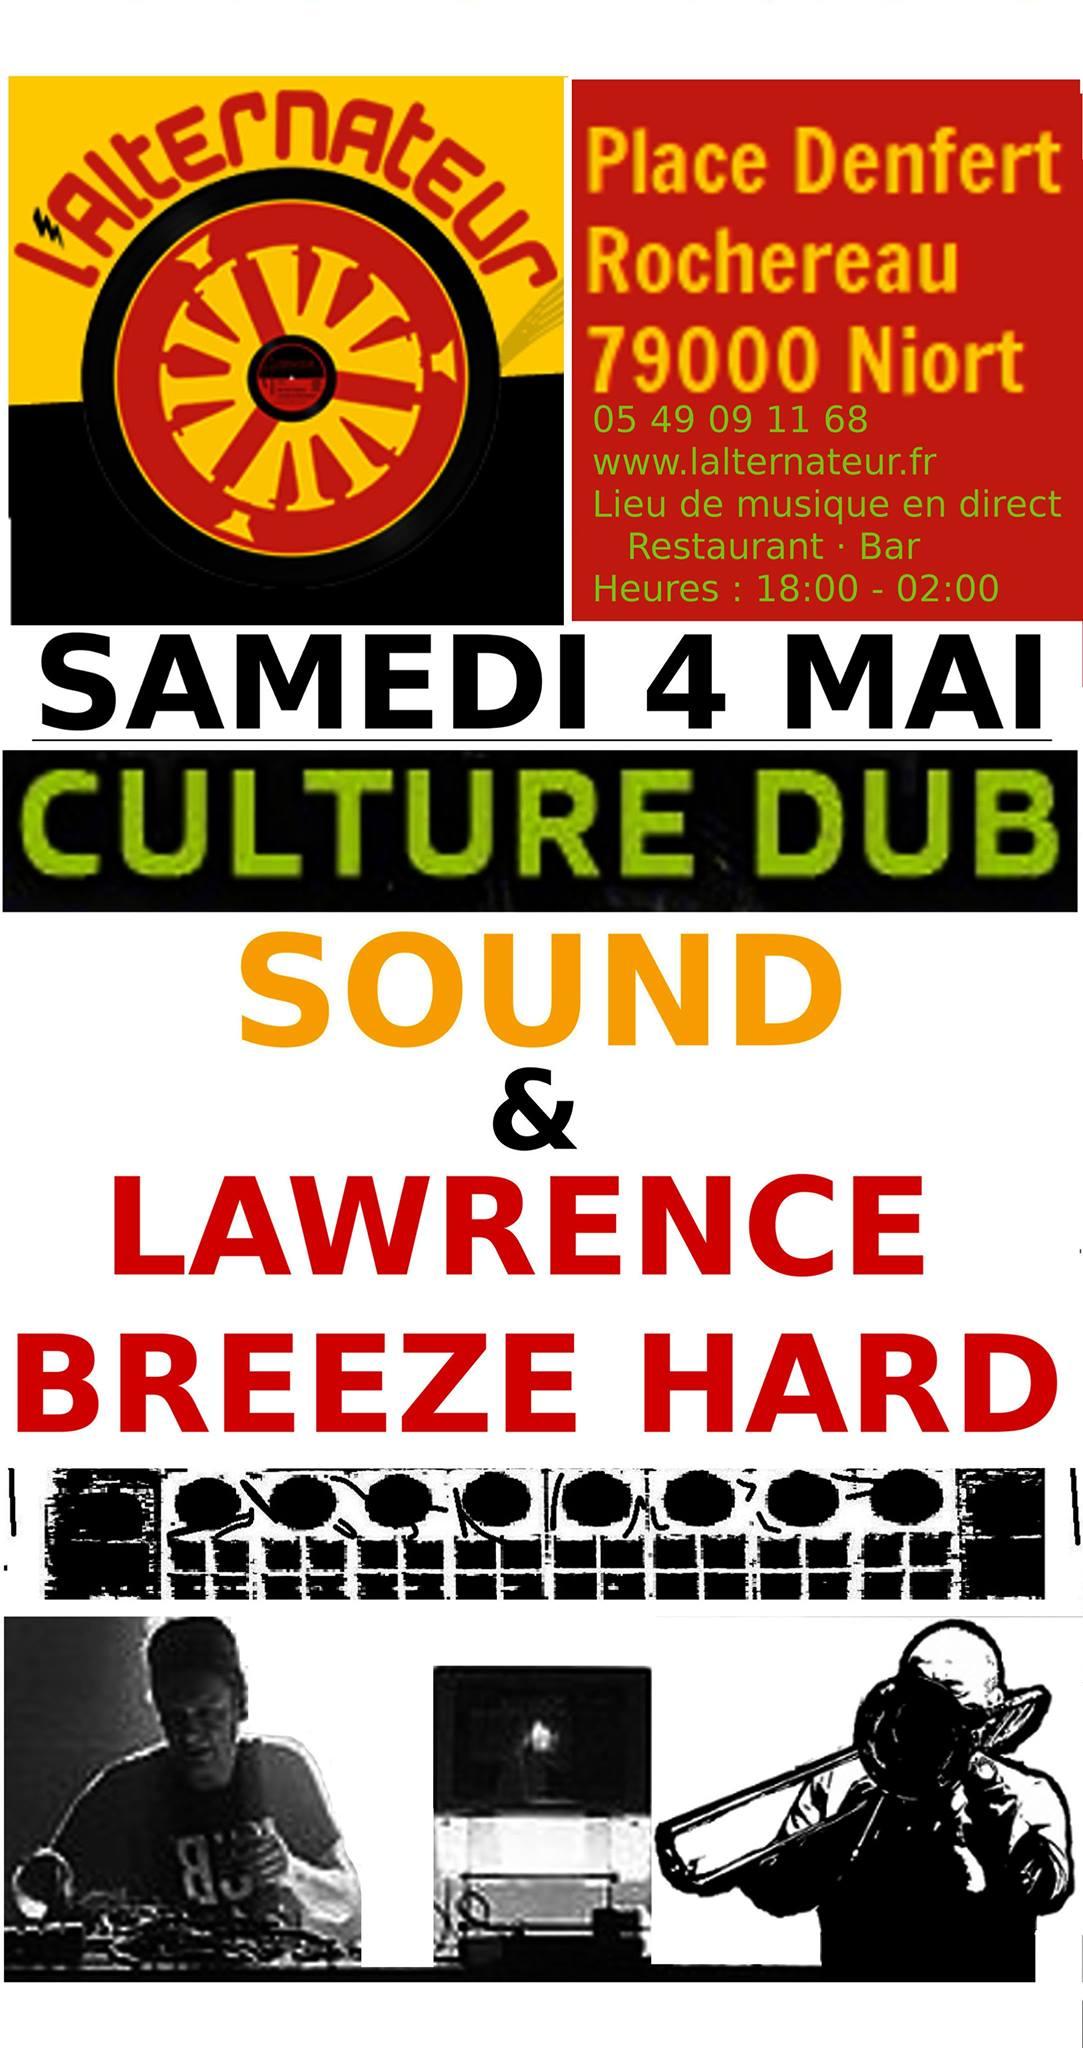 Culture Dub Sound & Lawrence Breeze Hard